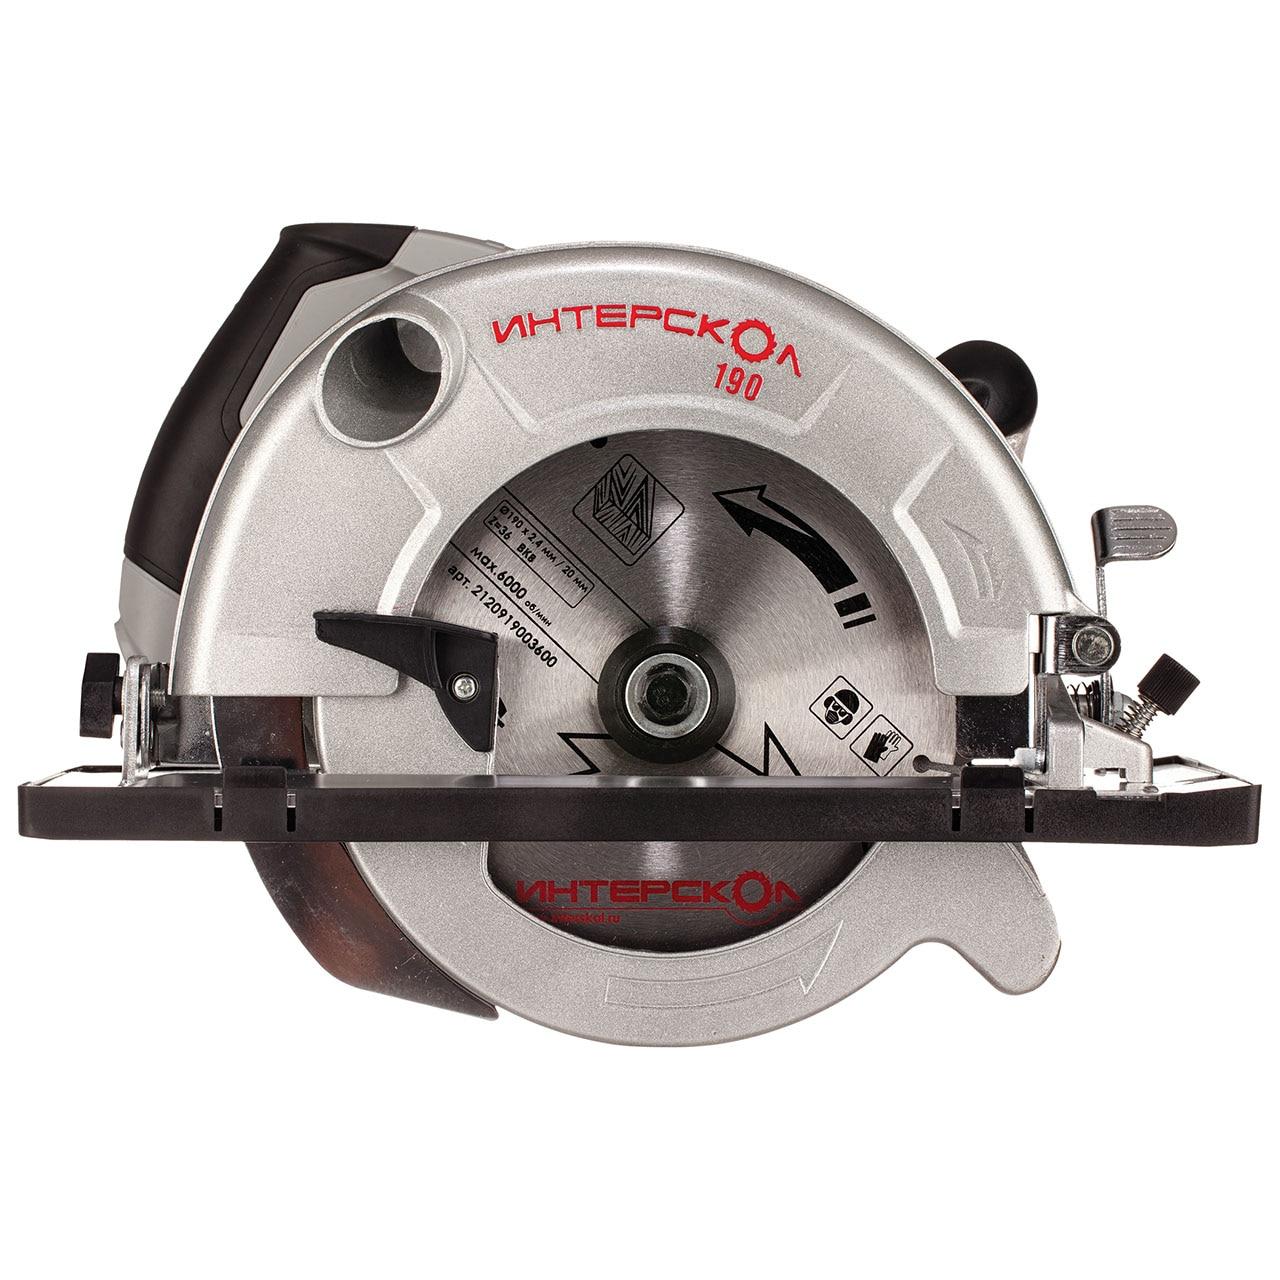 Circular saw Interskol DP-190/1600M цена